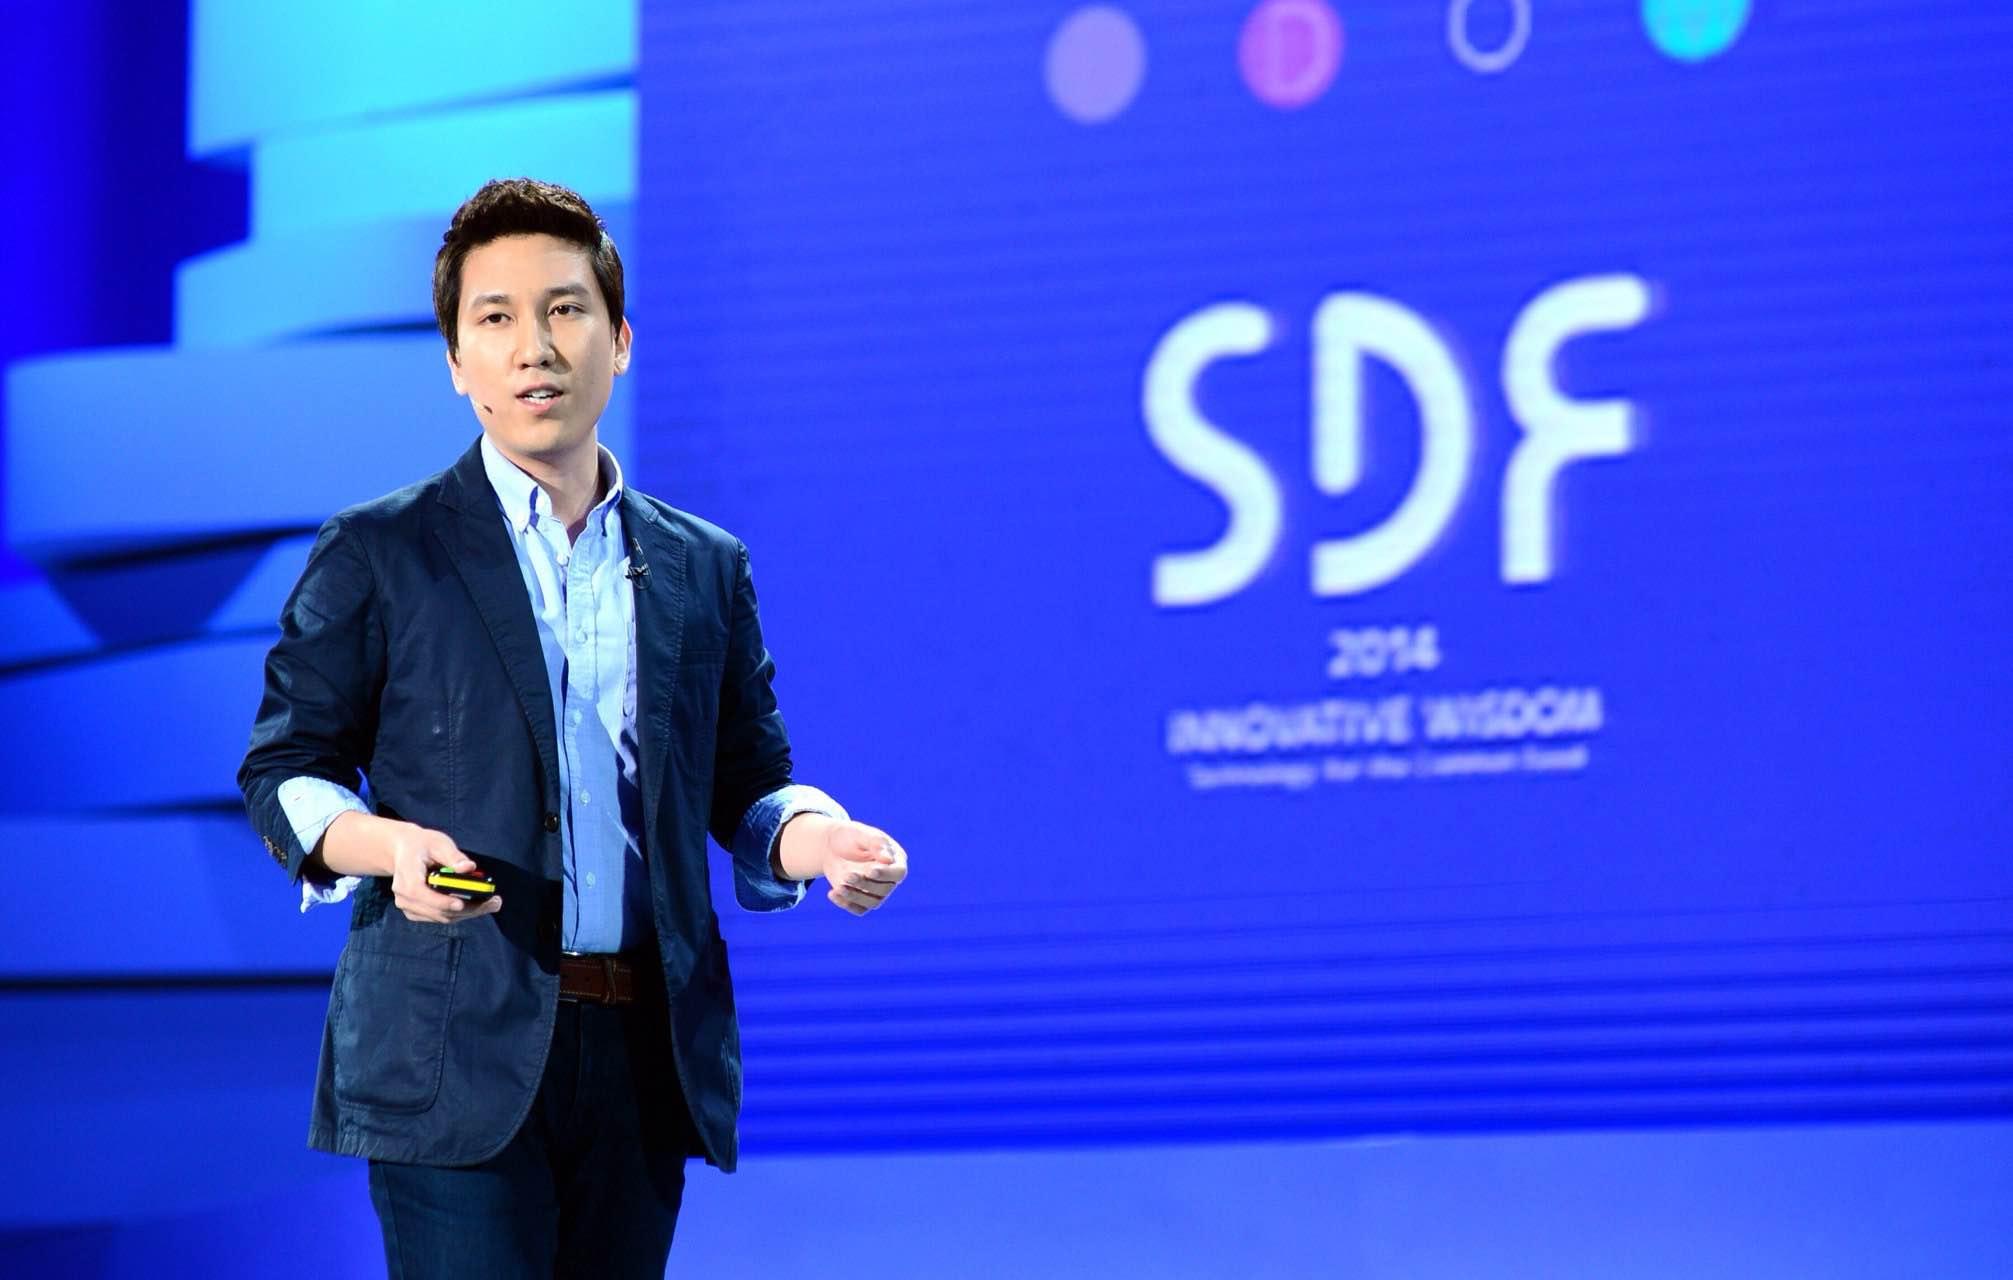 [Startup's Story #159] 680만 달러 투자 유치… 교육 스타트업 '노리'의 투자유치 비하인드 스토리